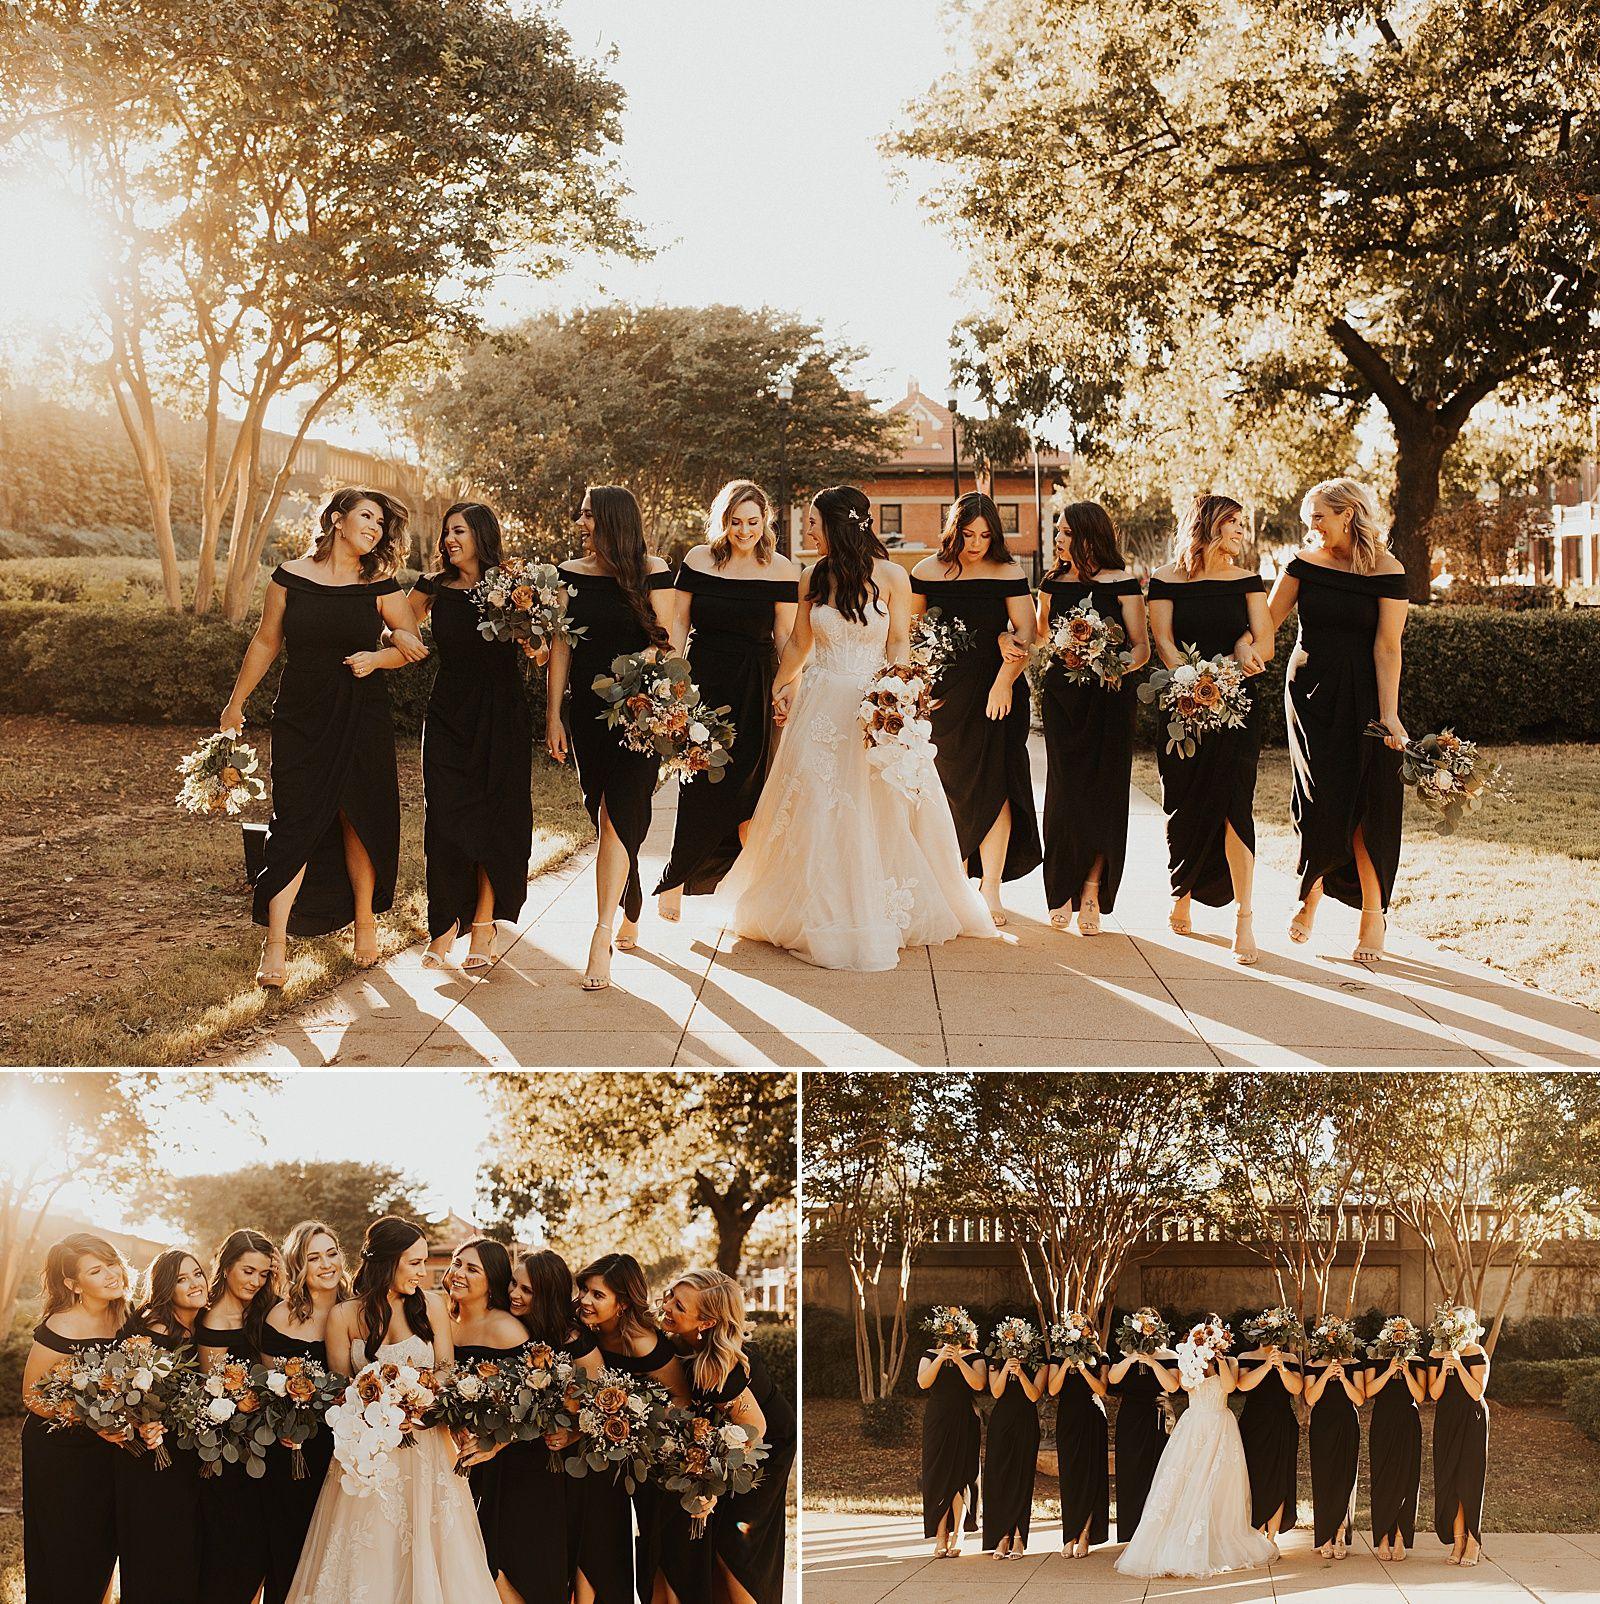 Grace Museum Wedding In Abilene Tx Lauren Alex Meg Amorette Photography Wedding Groomsmen Attire Black Bridal Parties Groomsmen Attire Black [ 1604 x 1600 Pixel ]